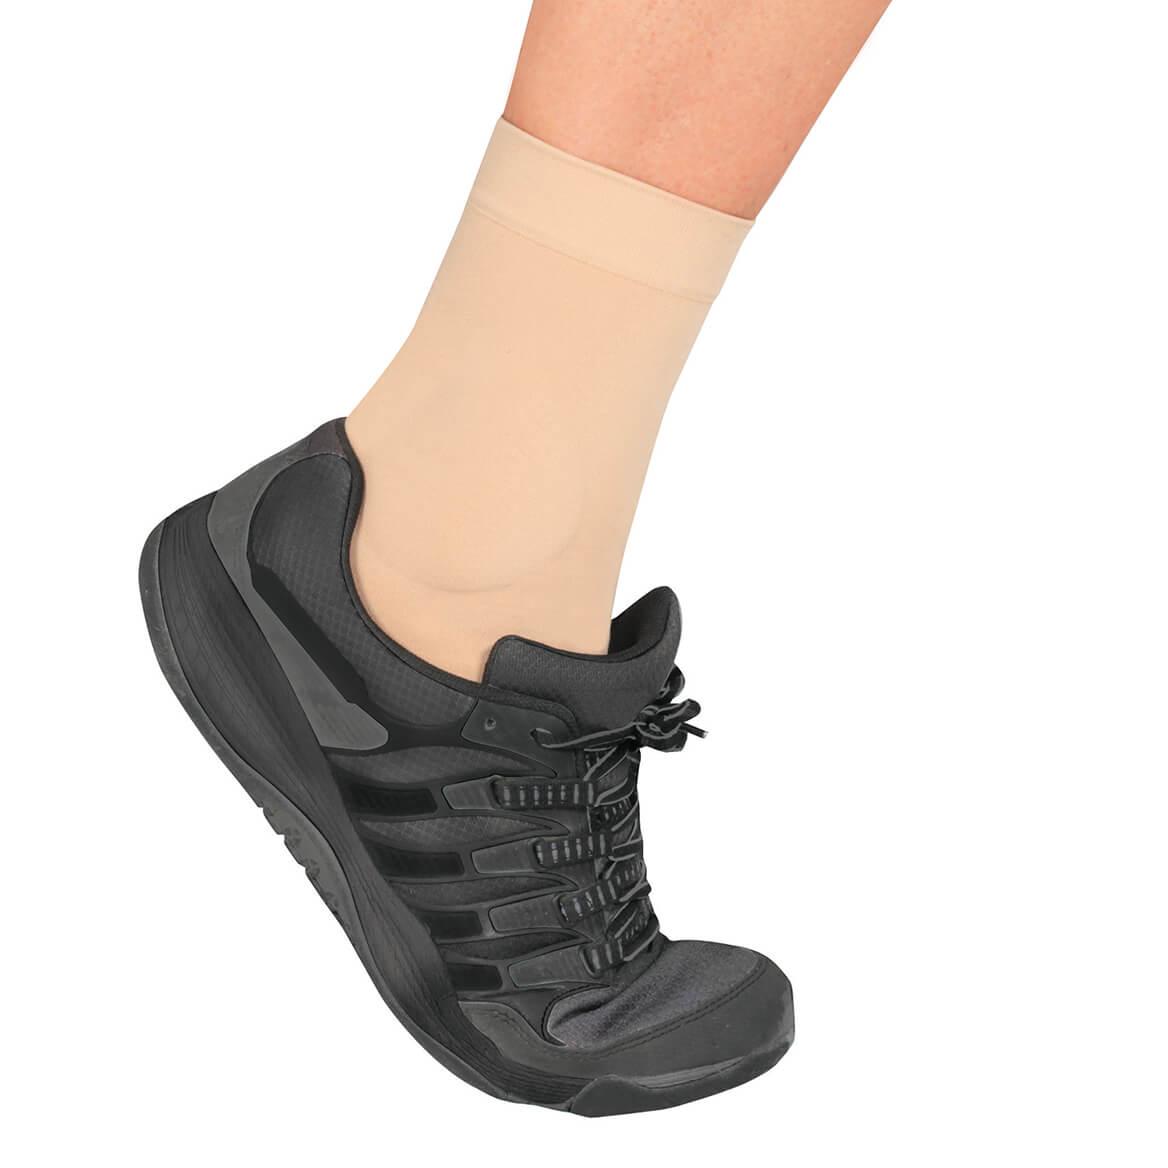 Gel Malleolar Ankle Sleeve-370143